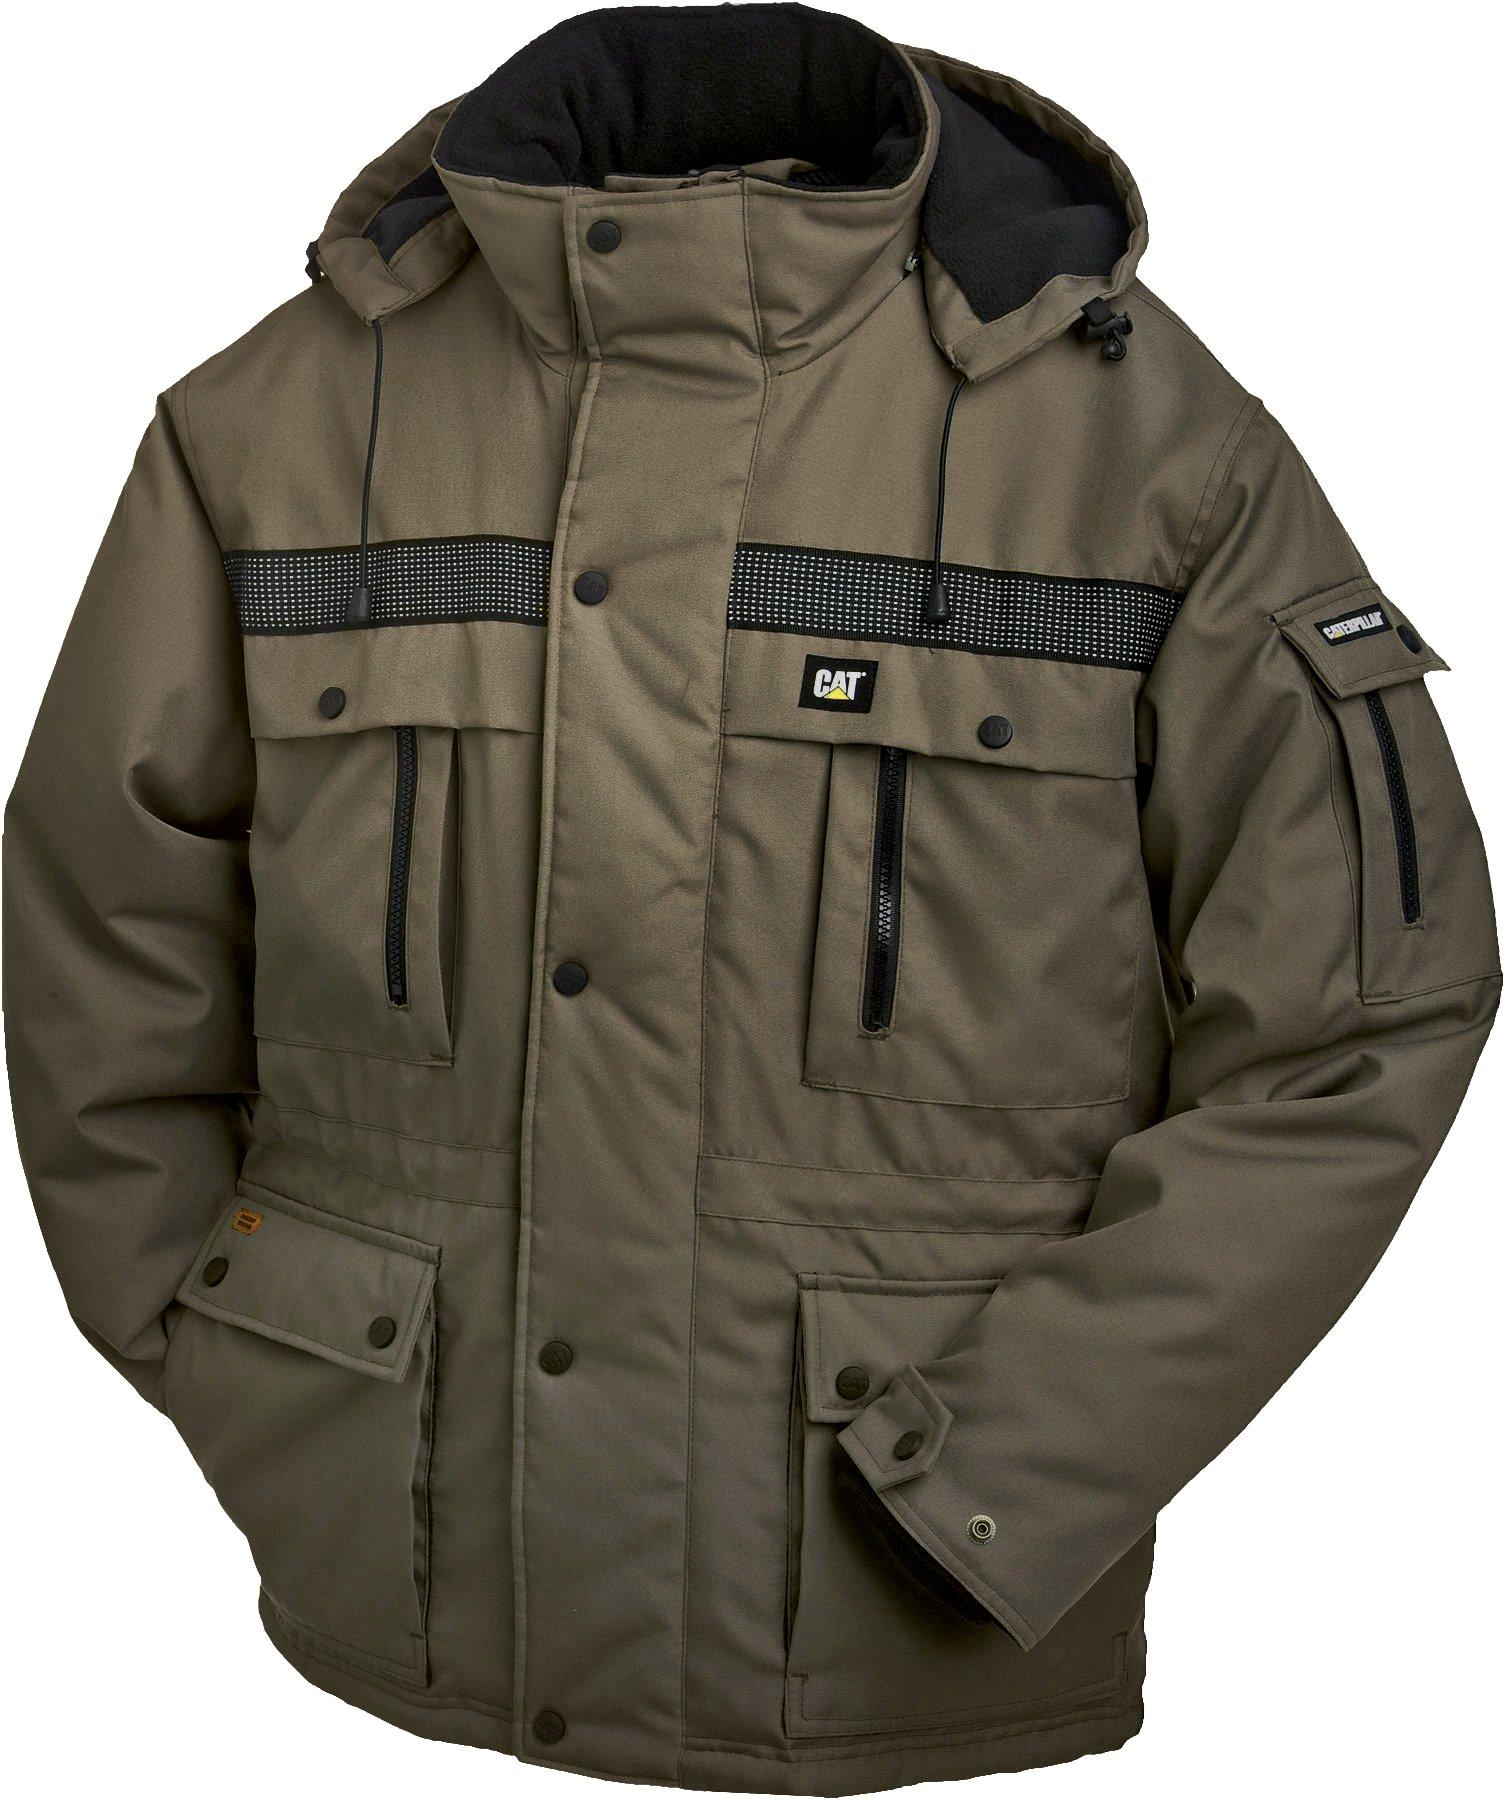 Caterpillar Mens Heavy Insulated Parka CAT Men/'s Sportswear /& Accessories W11432